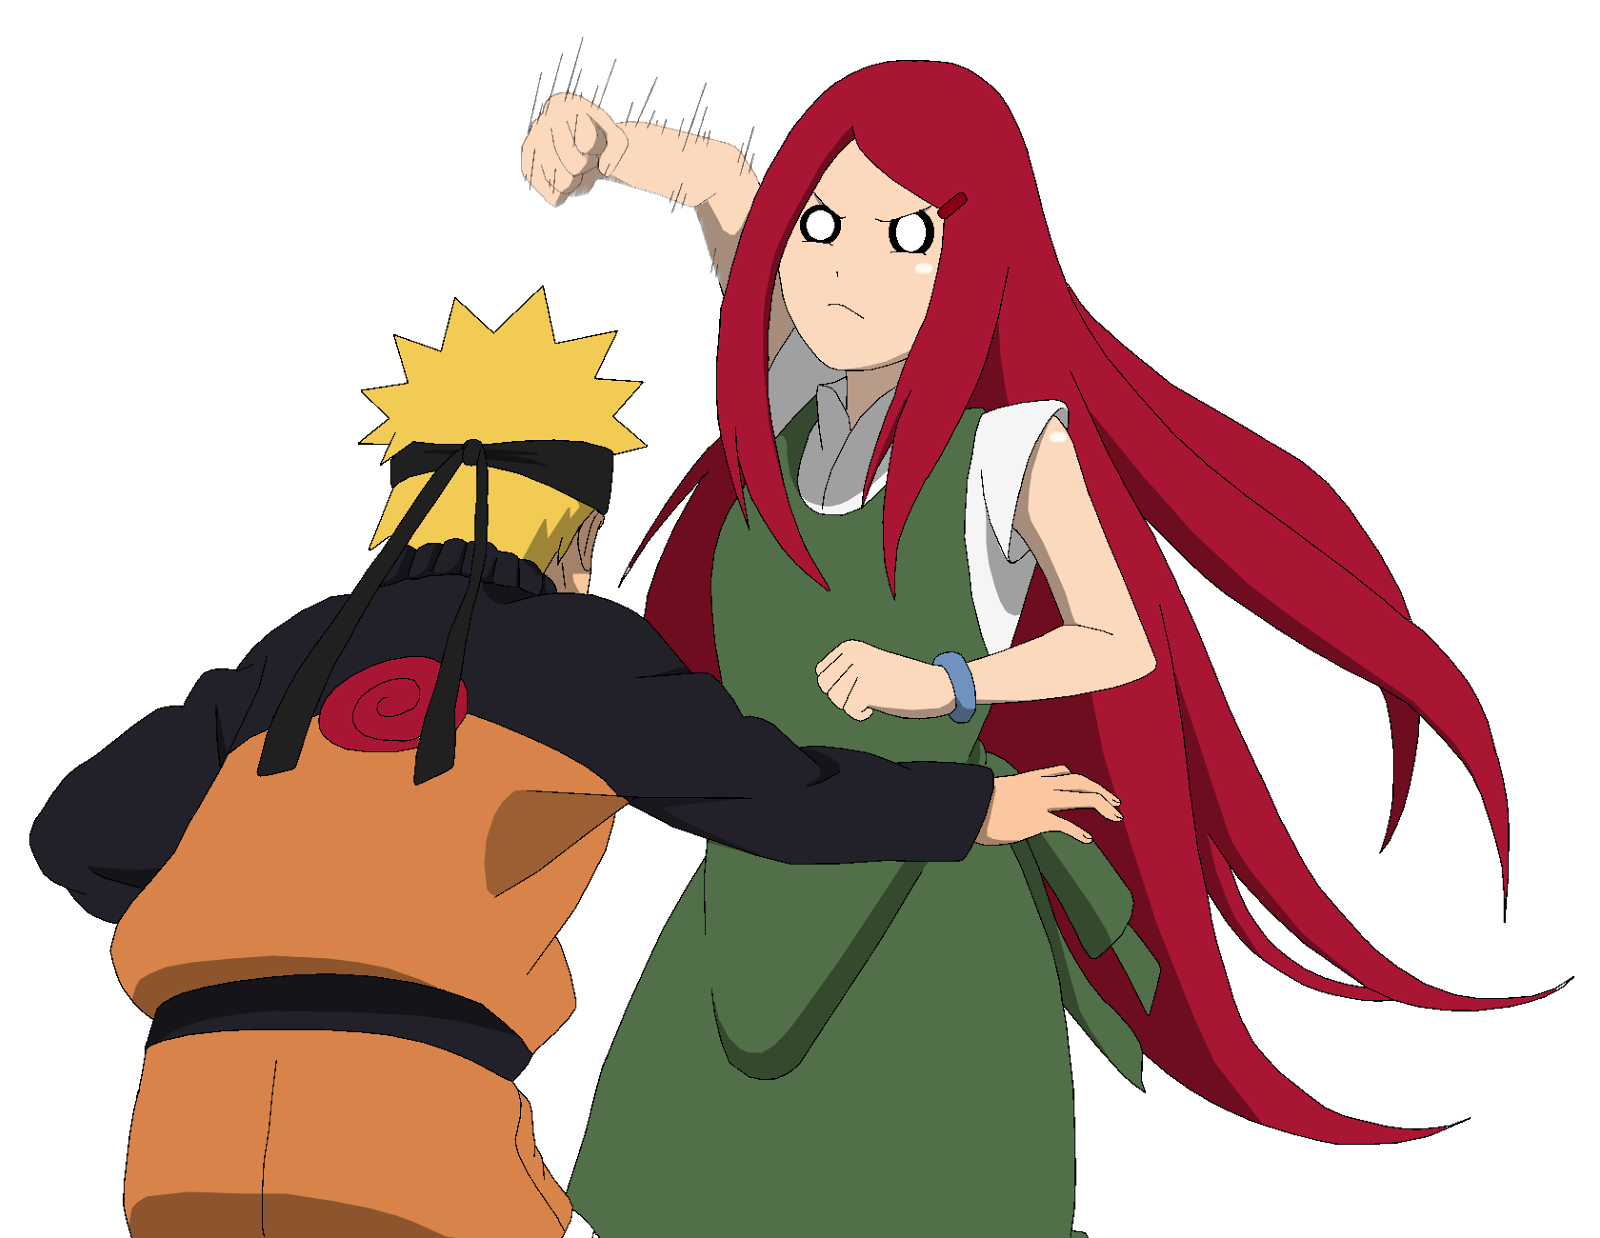 Animé Imágenes By Akatsuki Karasu: 29 Renders De Naruto